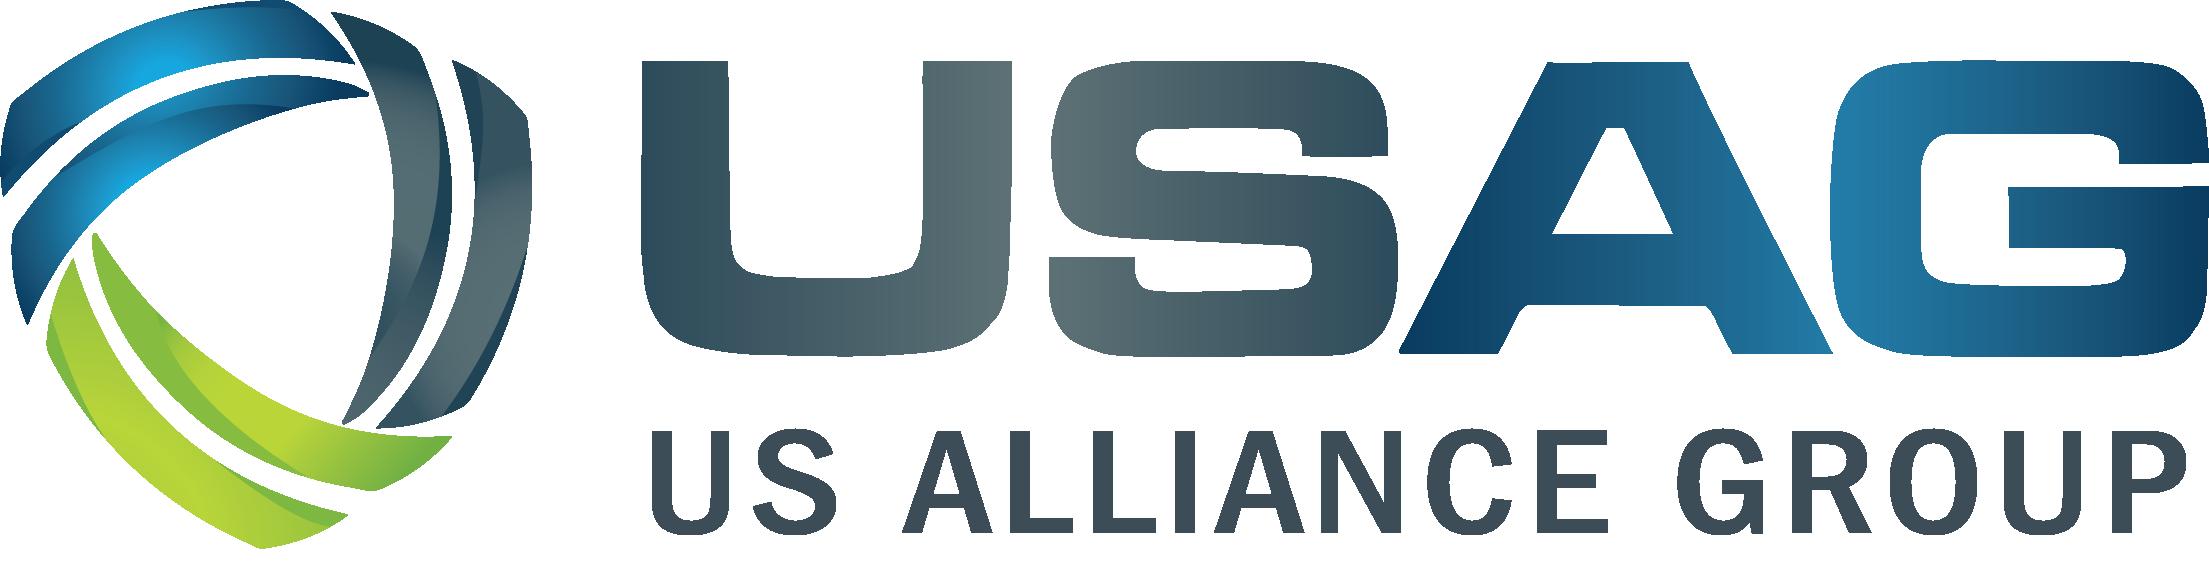 US Alliance Group, Inc